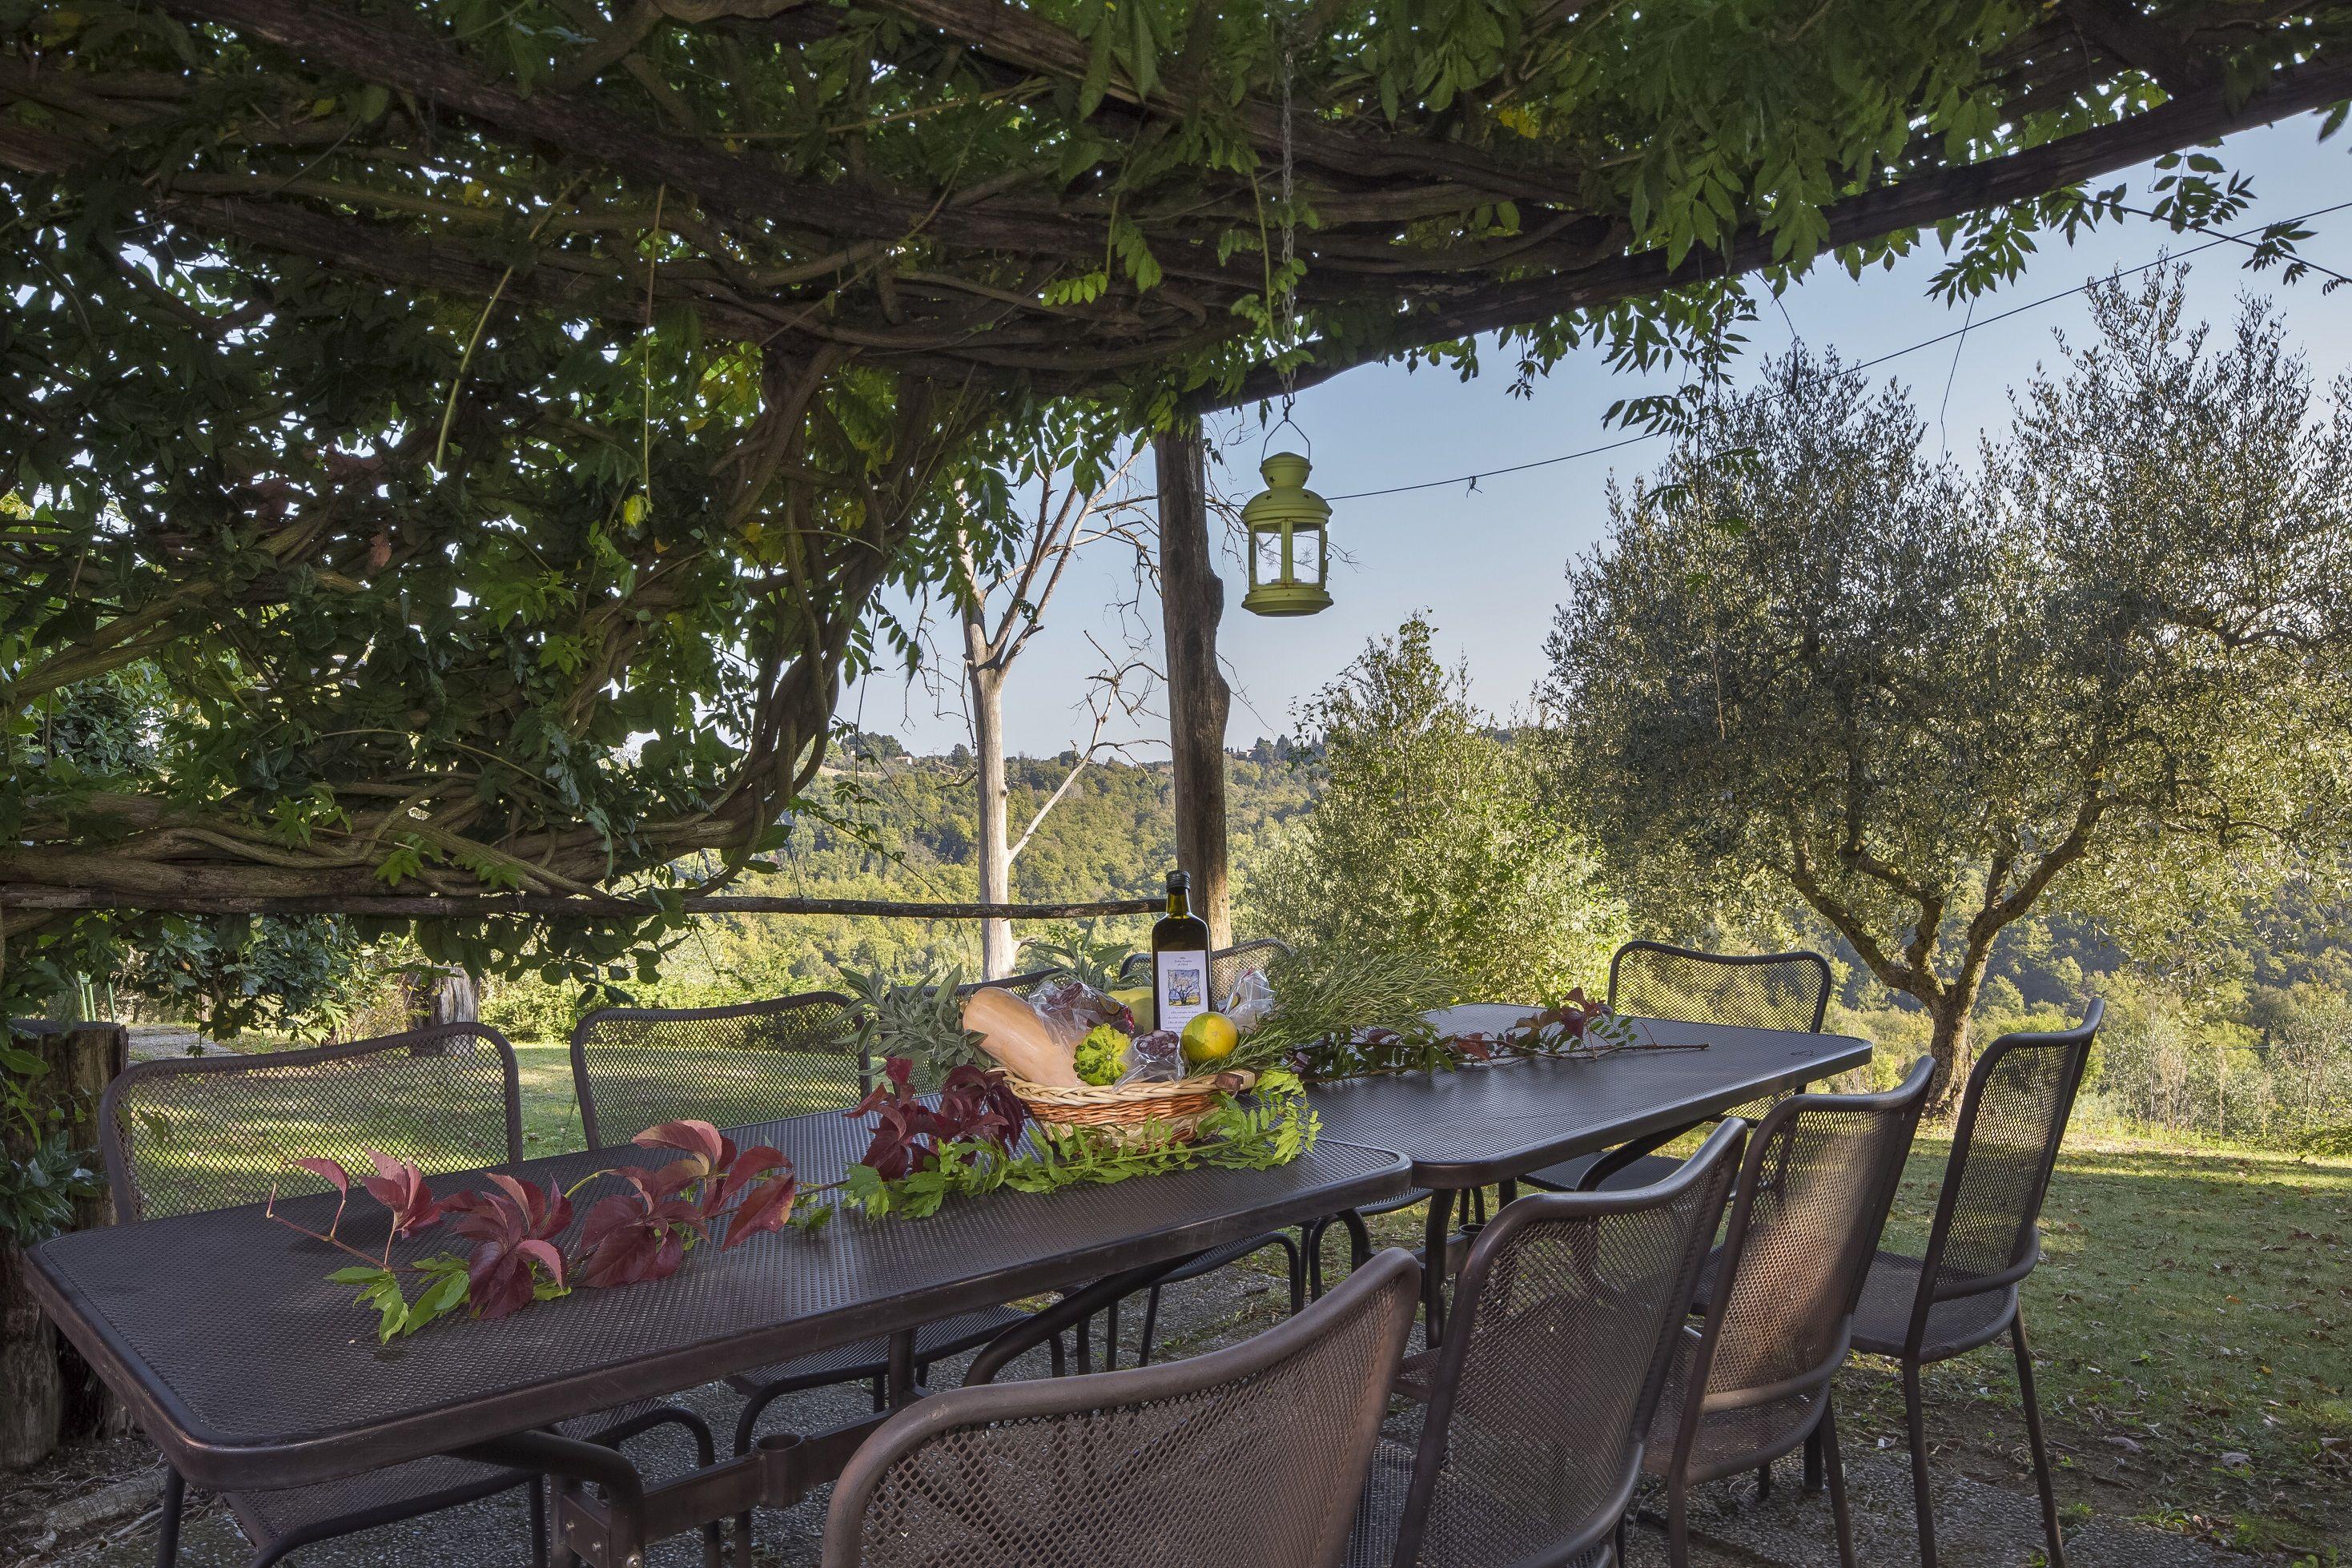 Apartment Bosco Lazzeroni Residence - Aida Holiday Home photo 19005580